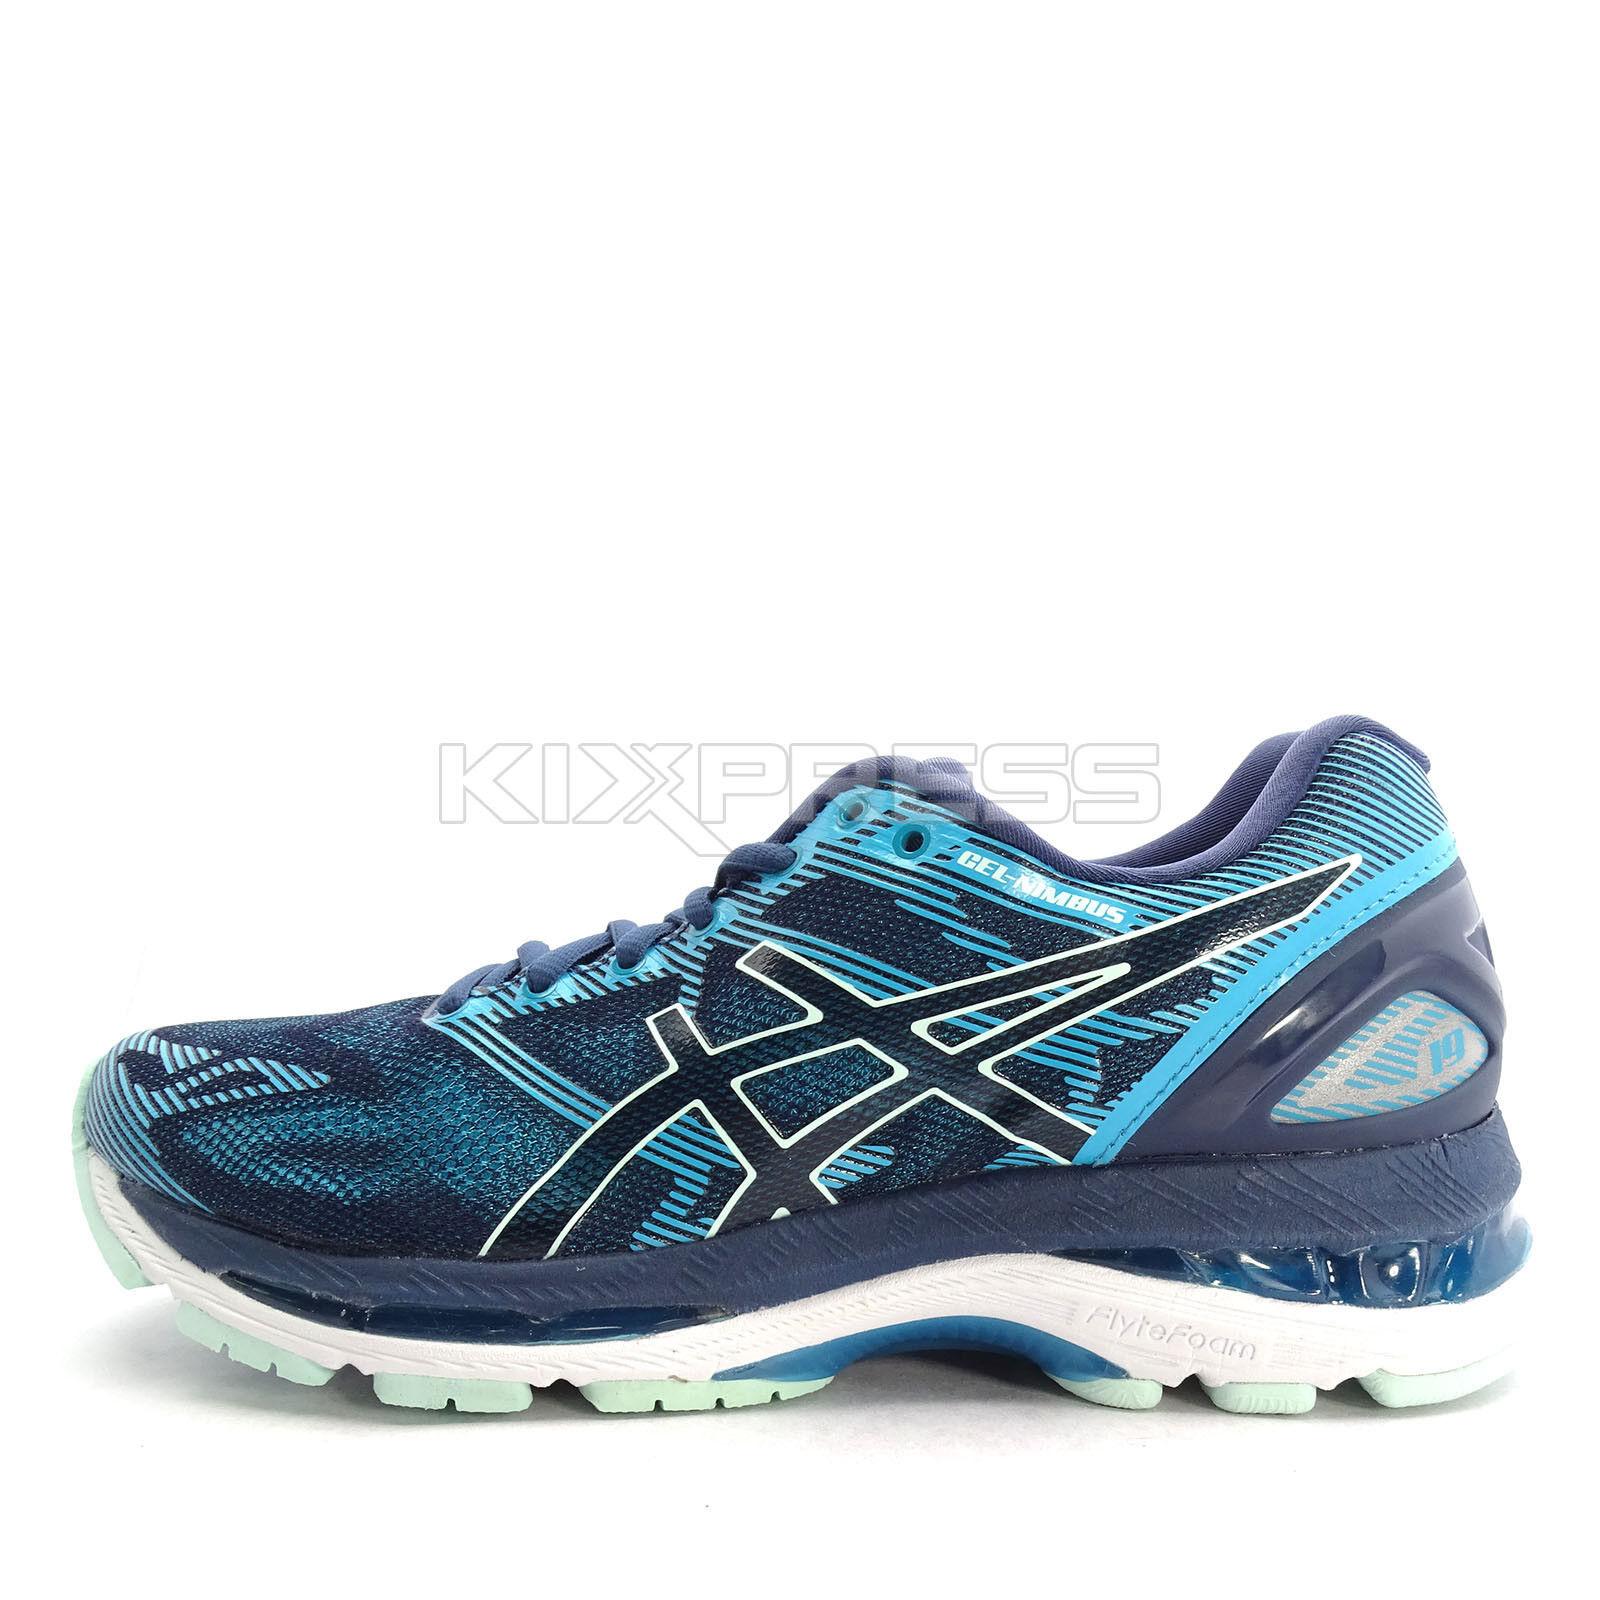 Asics GEL-Nimbus 19 [T750N-5067] Women Running Shoes Insignia Blue/Glacier Sea